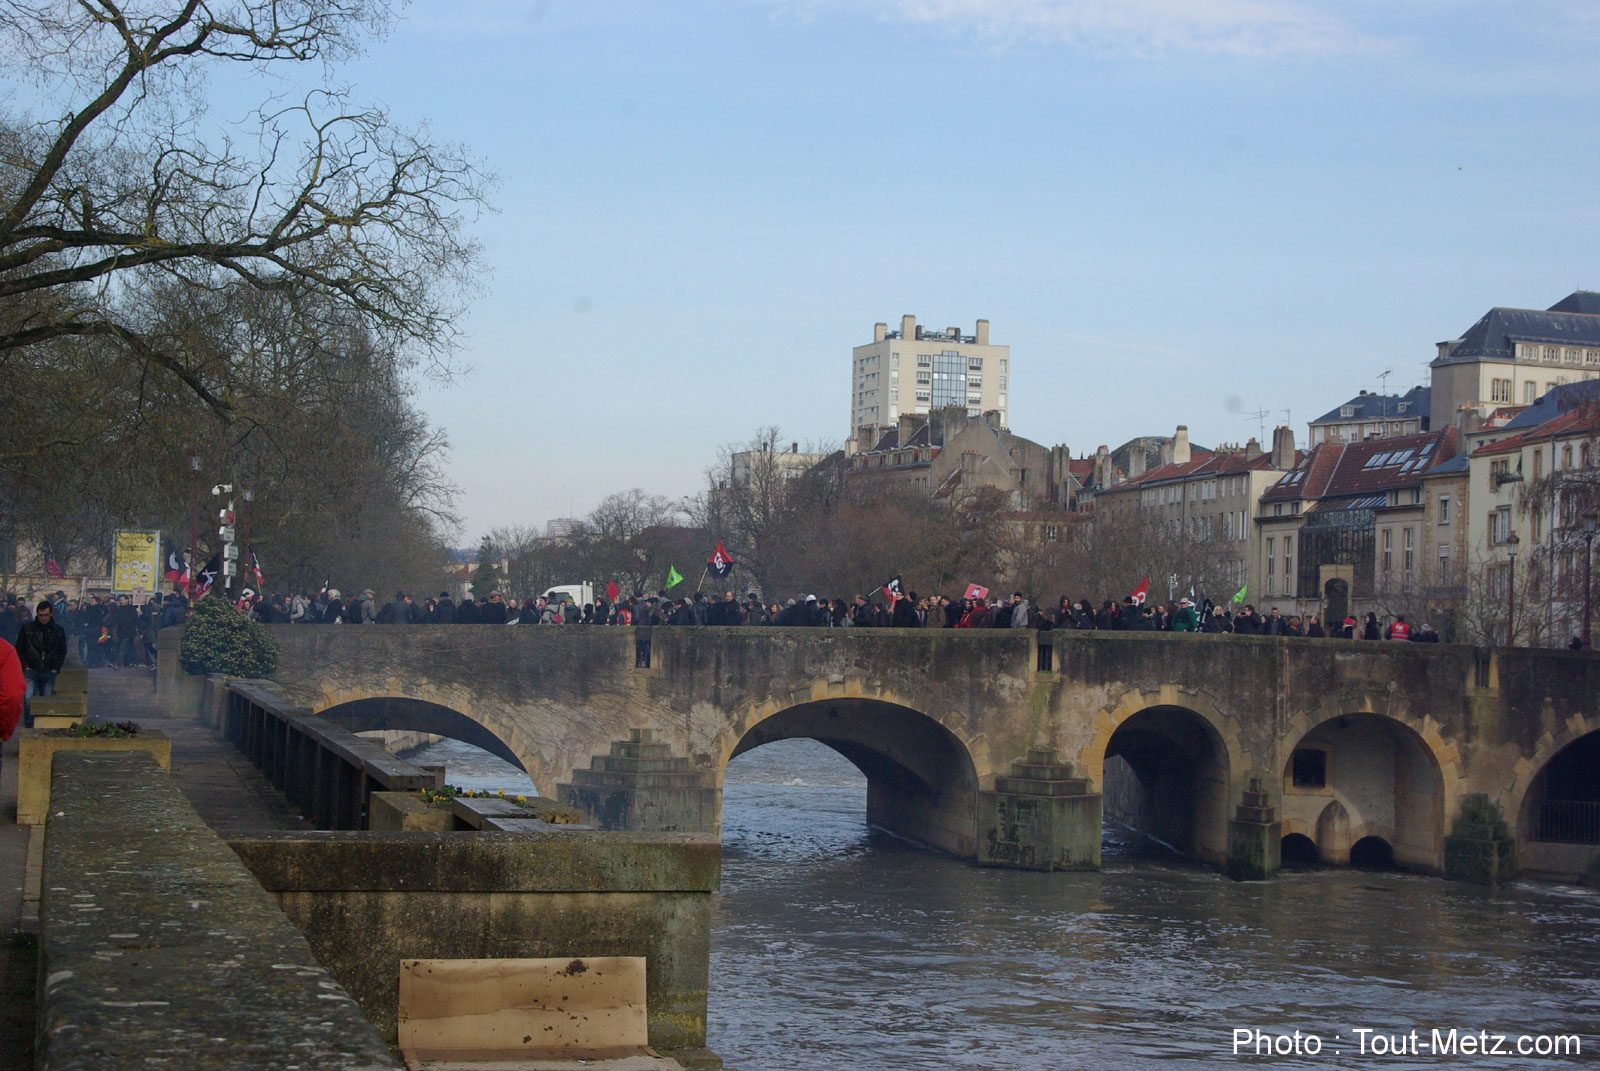 Manifestation du 22 mars à Metz : une forte mobilisation